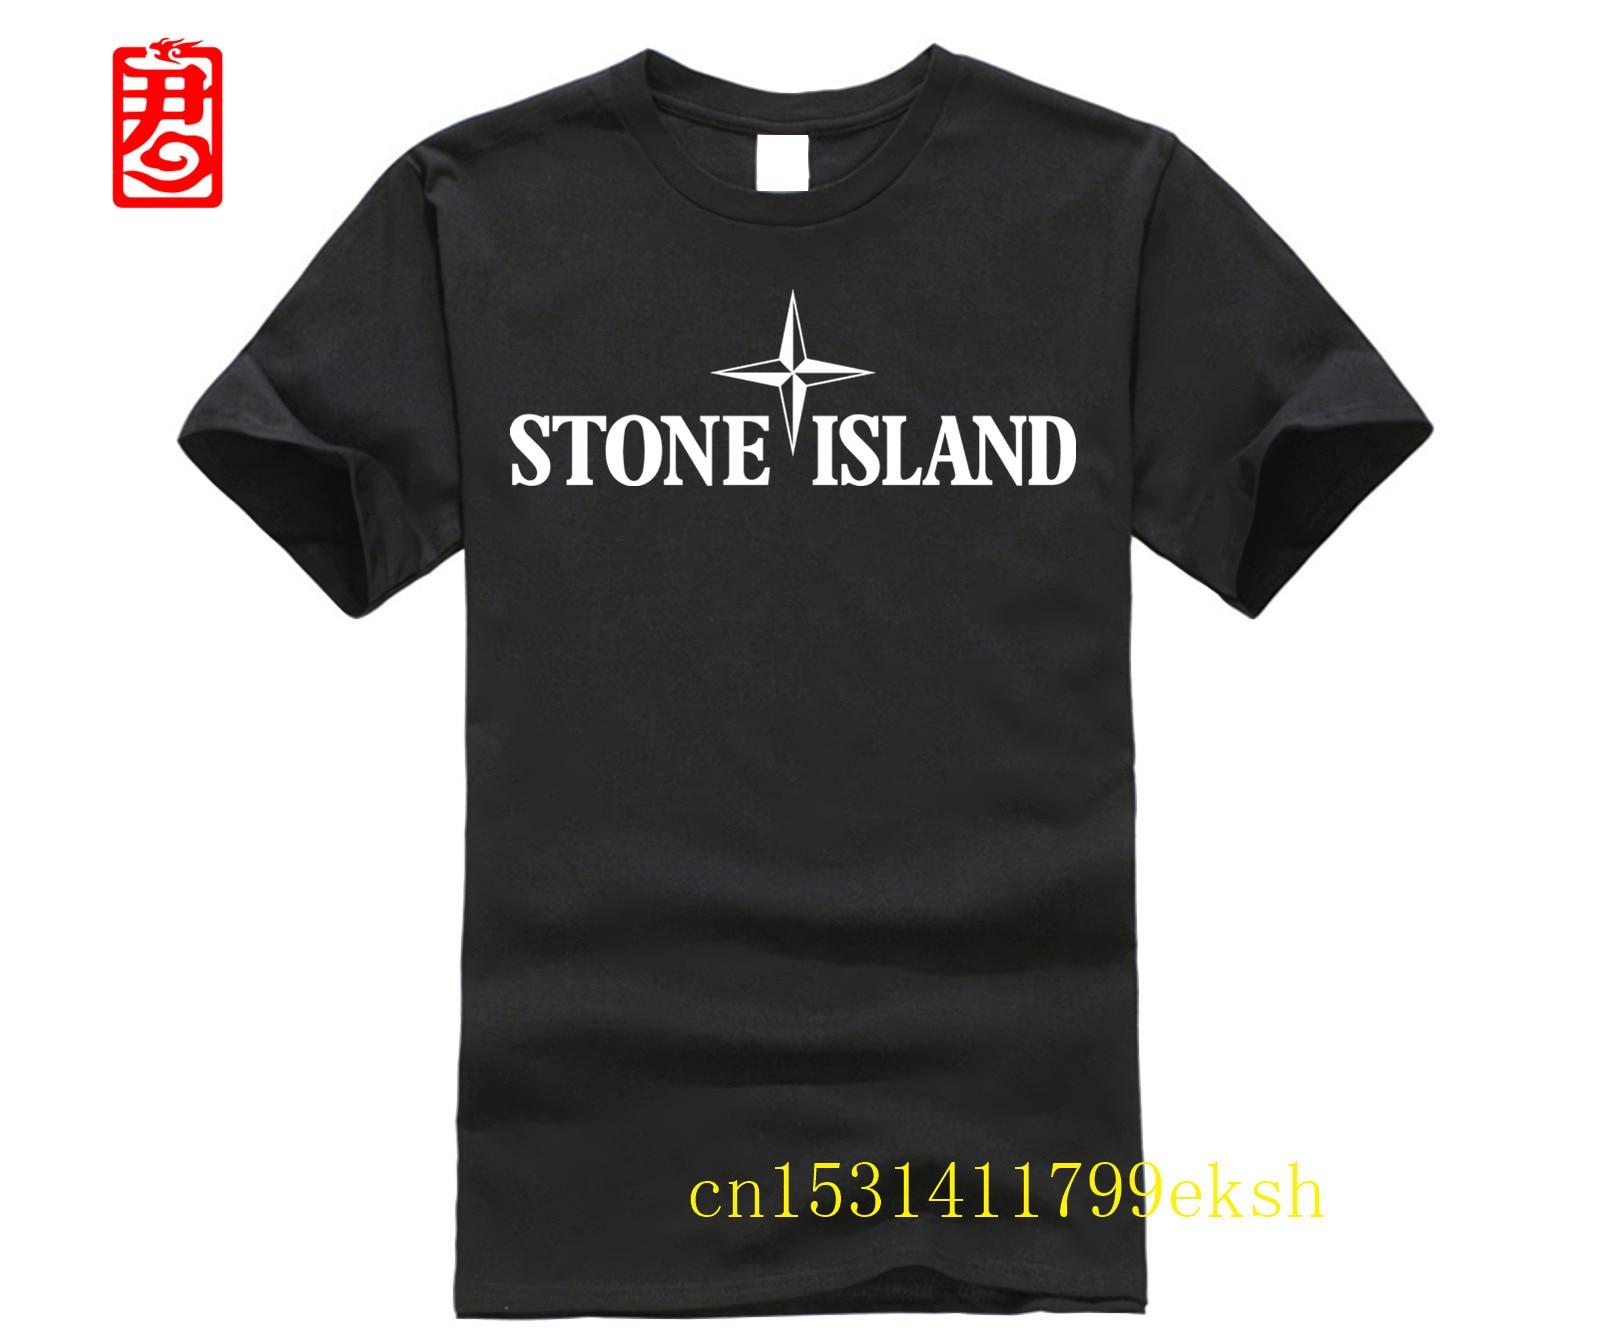 Stone Men Black S - 3Xl  Men T-Shirt Cotton TEE Shirt Custom Screen Printed Men Tee T Shirt Short Sleeve O-Neck Island TEE